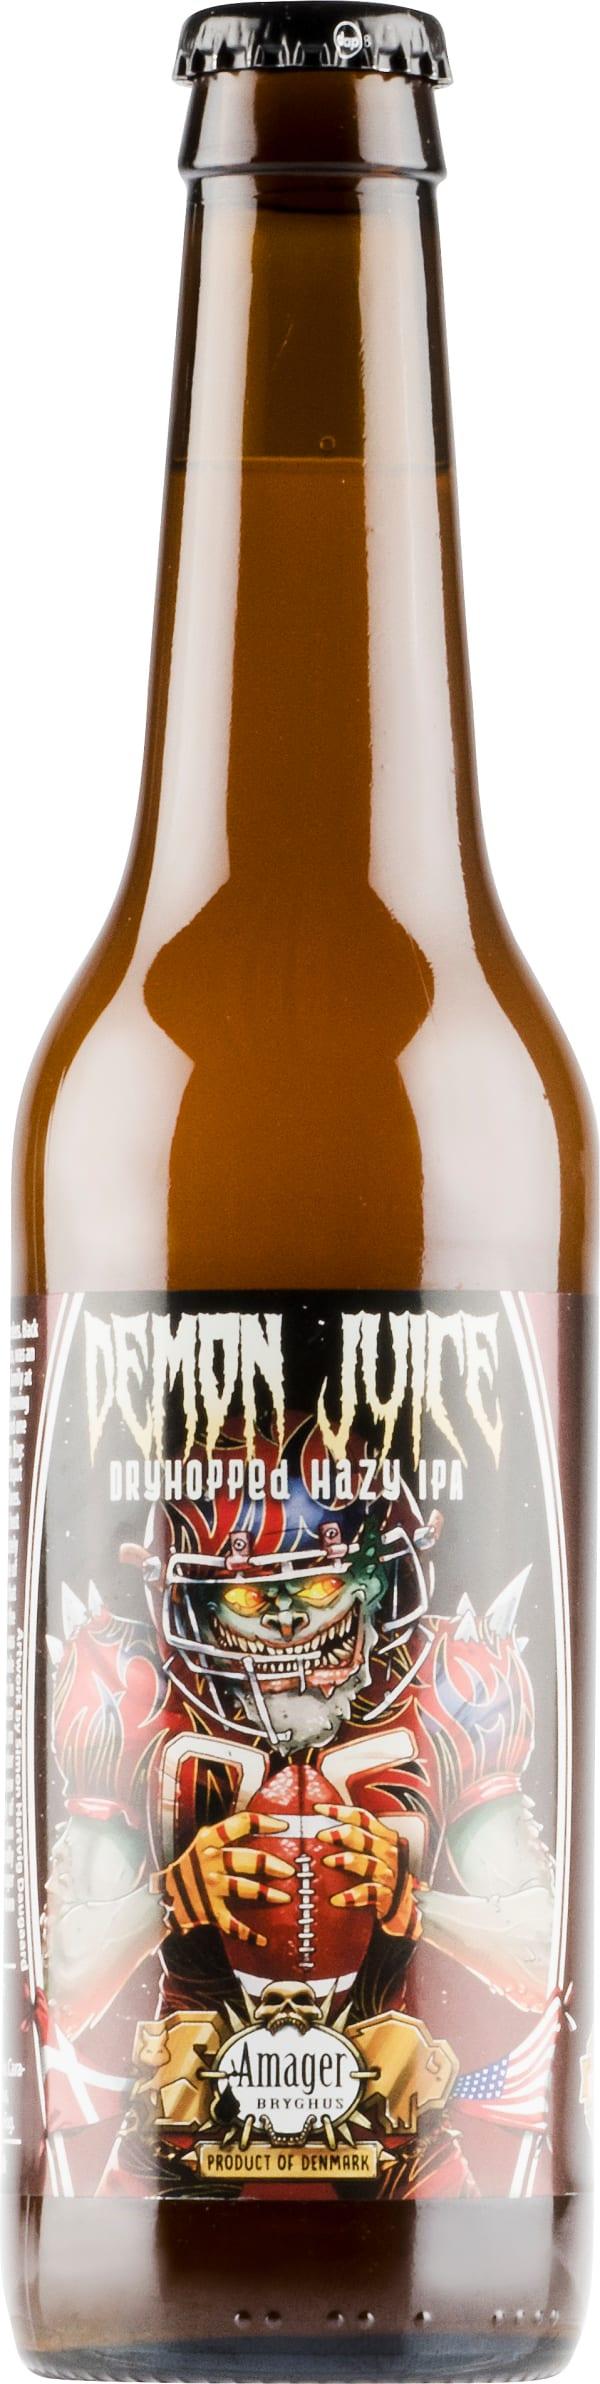 Amager Demon Juice Hazy IPA